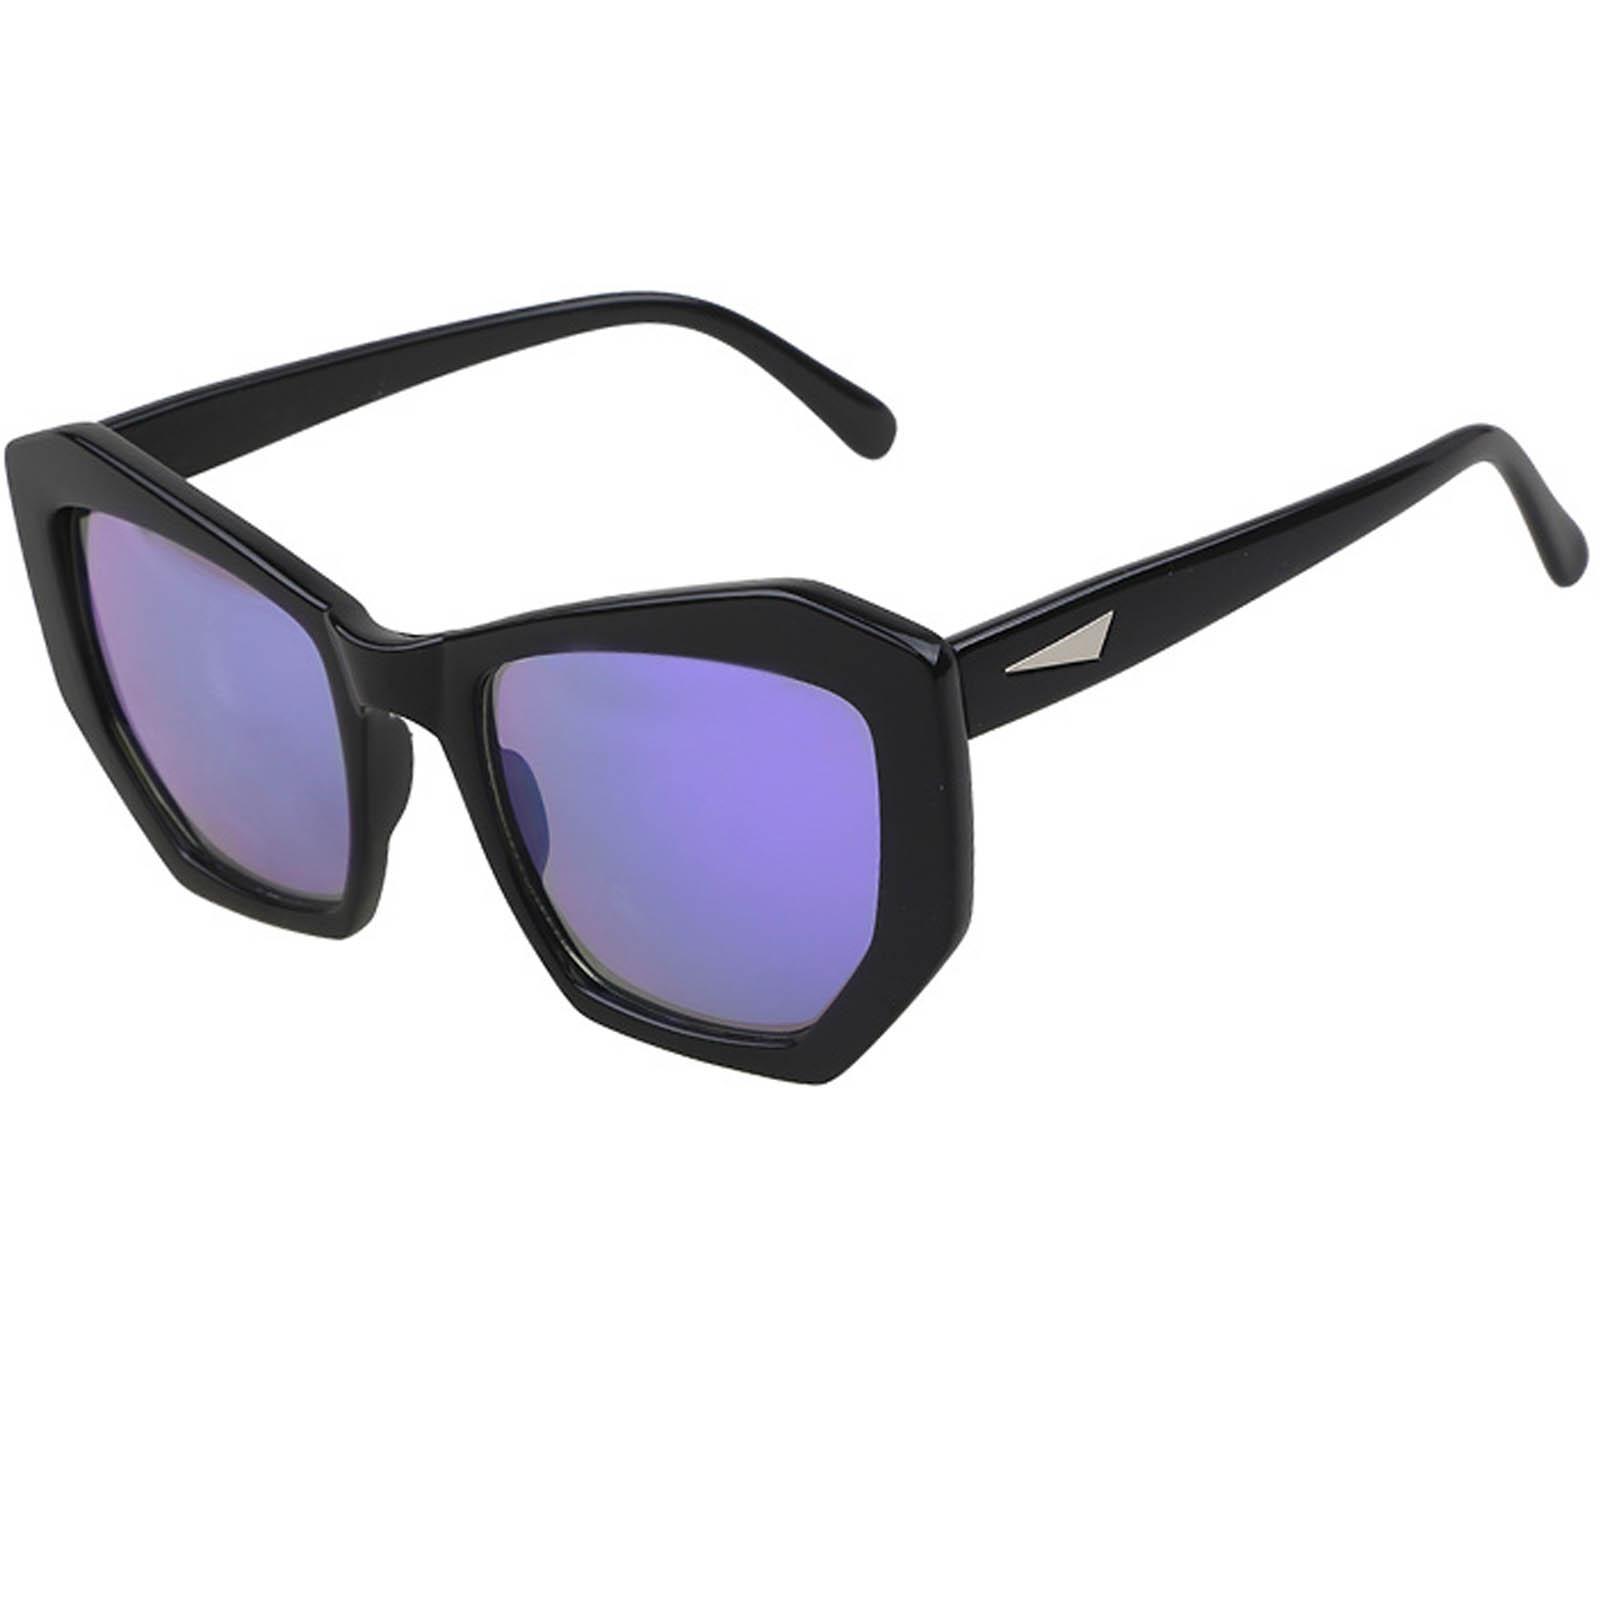 OWL ® 059 C1 CatPentagon Eyewear Sunglasses Women's Men's Plastic White Frame Purple Lens One Pair